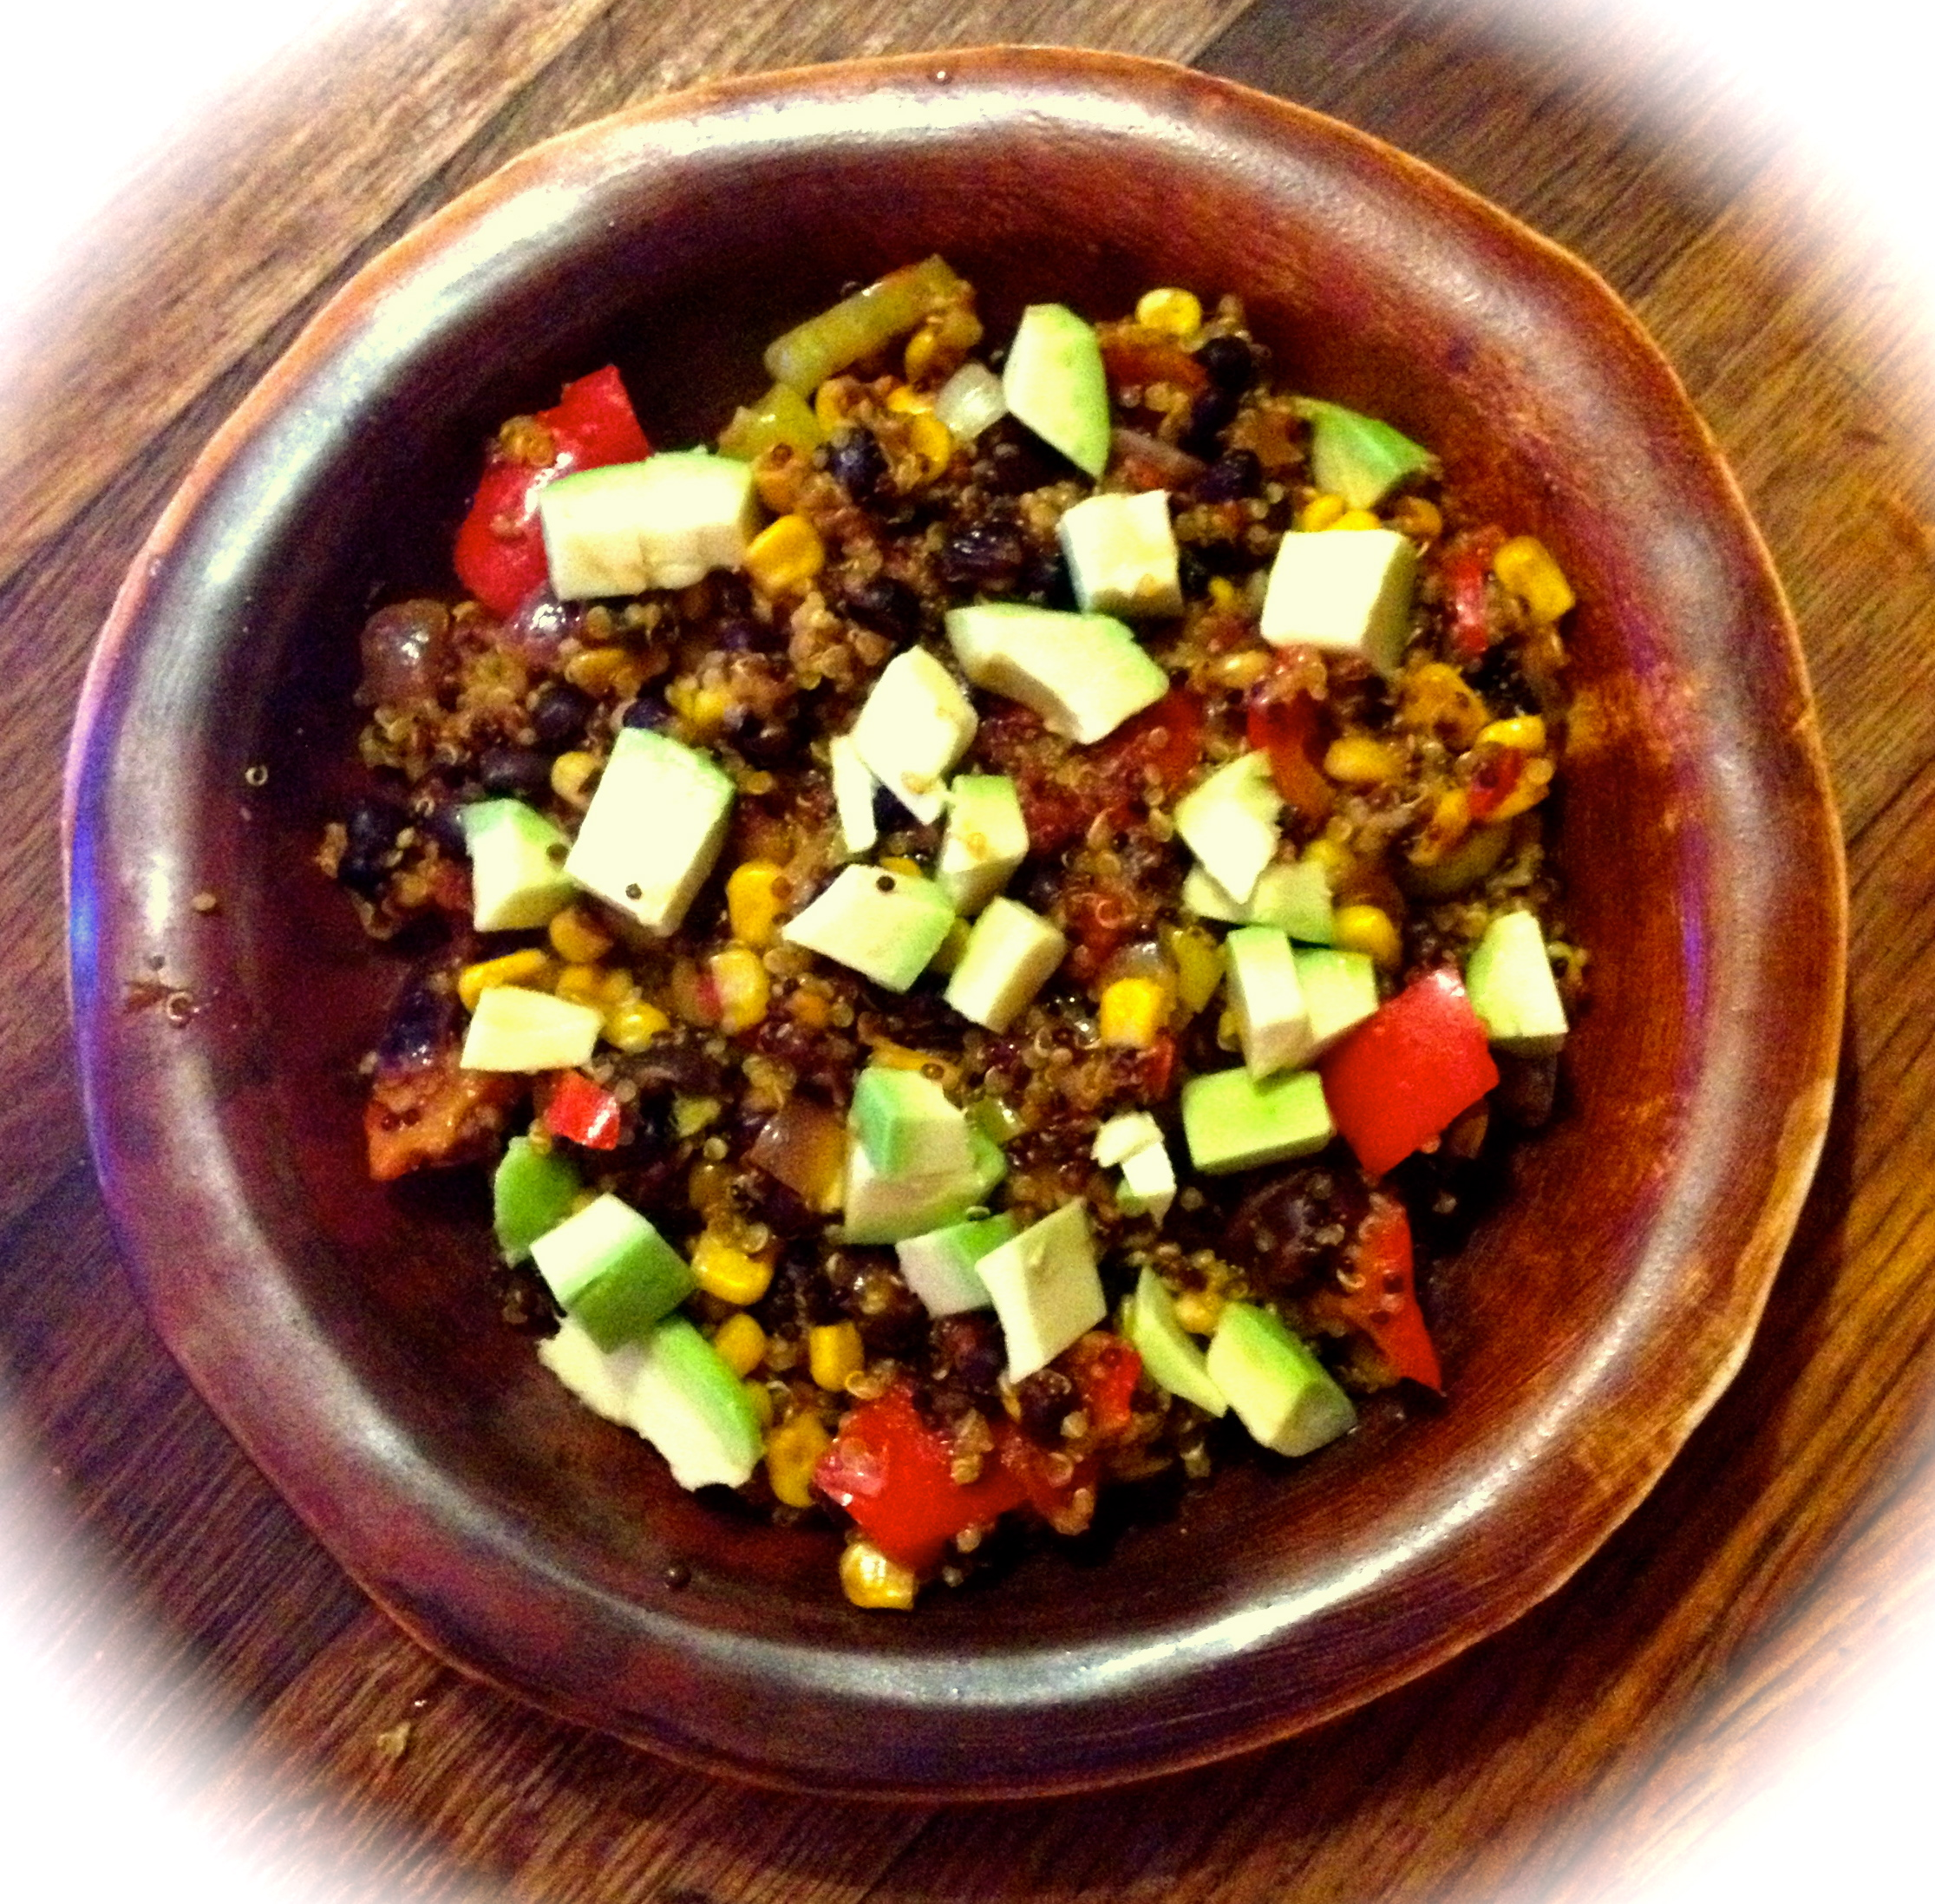 Spicy Quinoa with Avocado